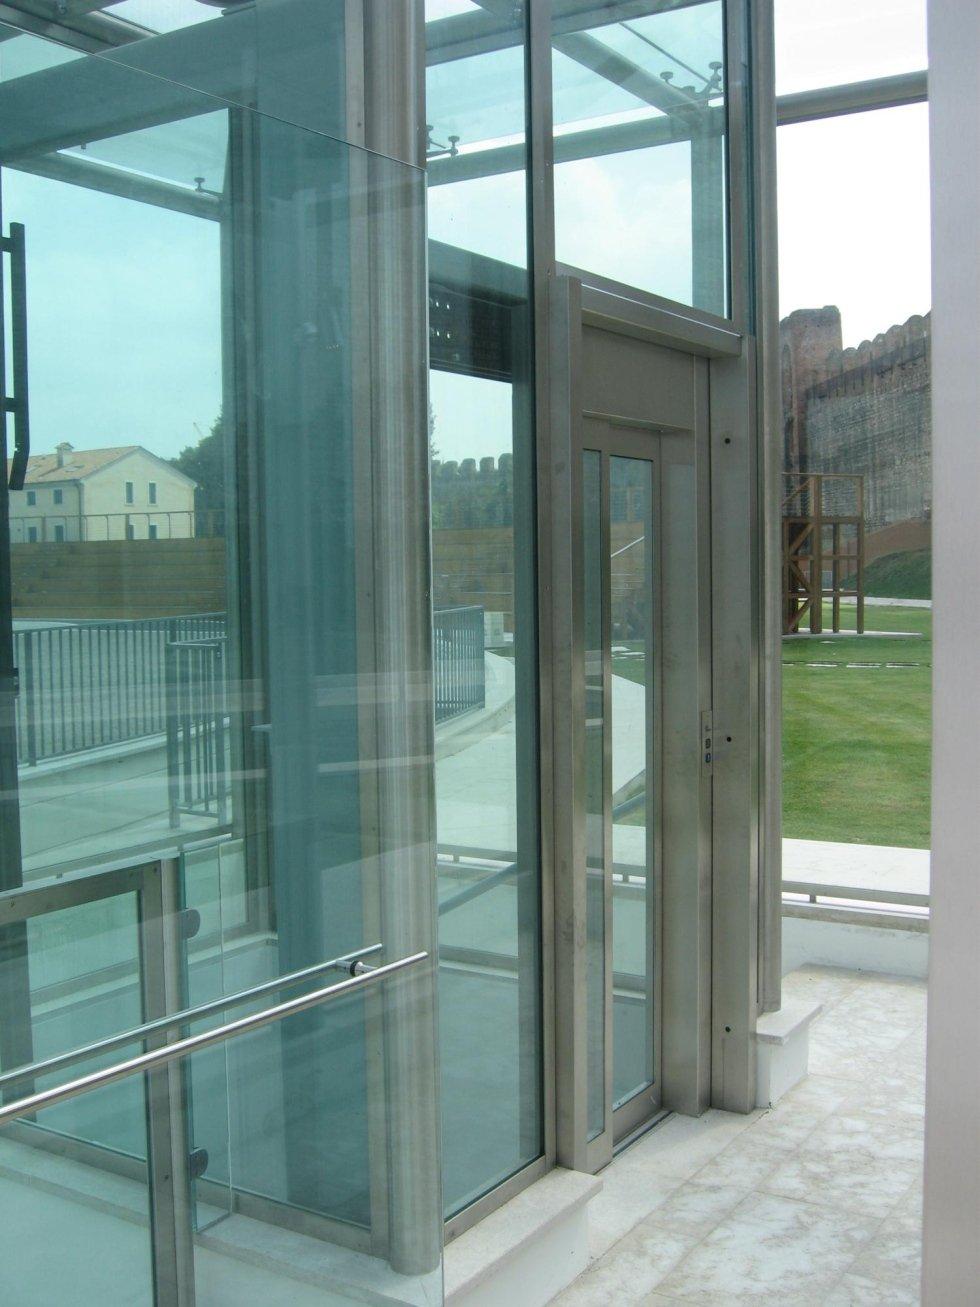 ascensore panoramico in giardino